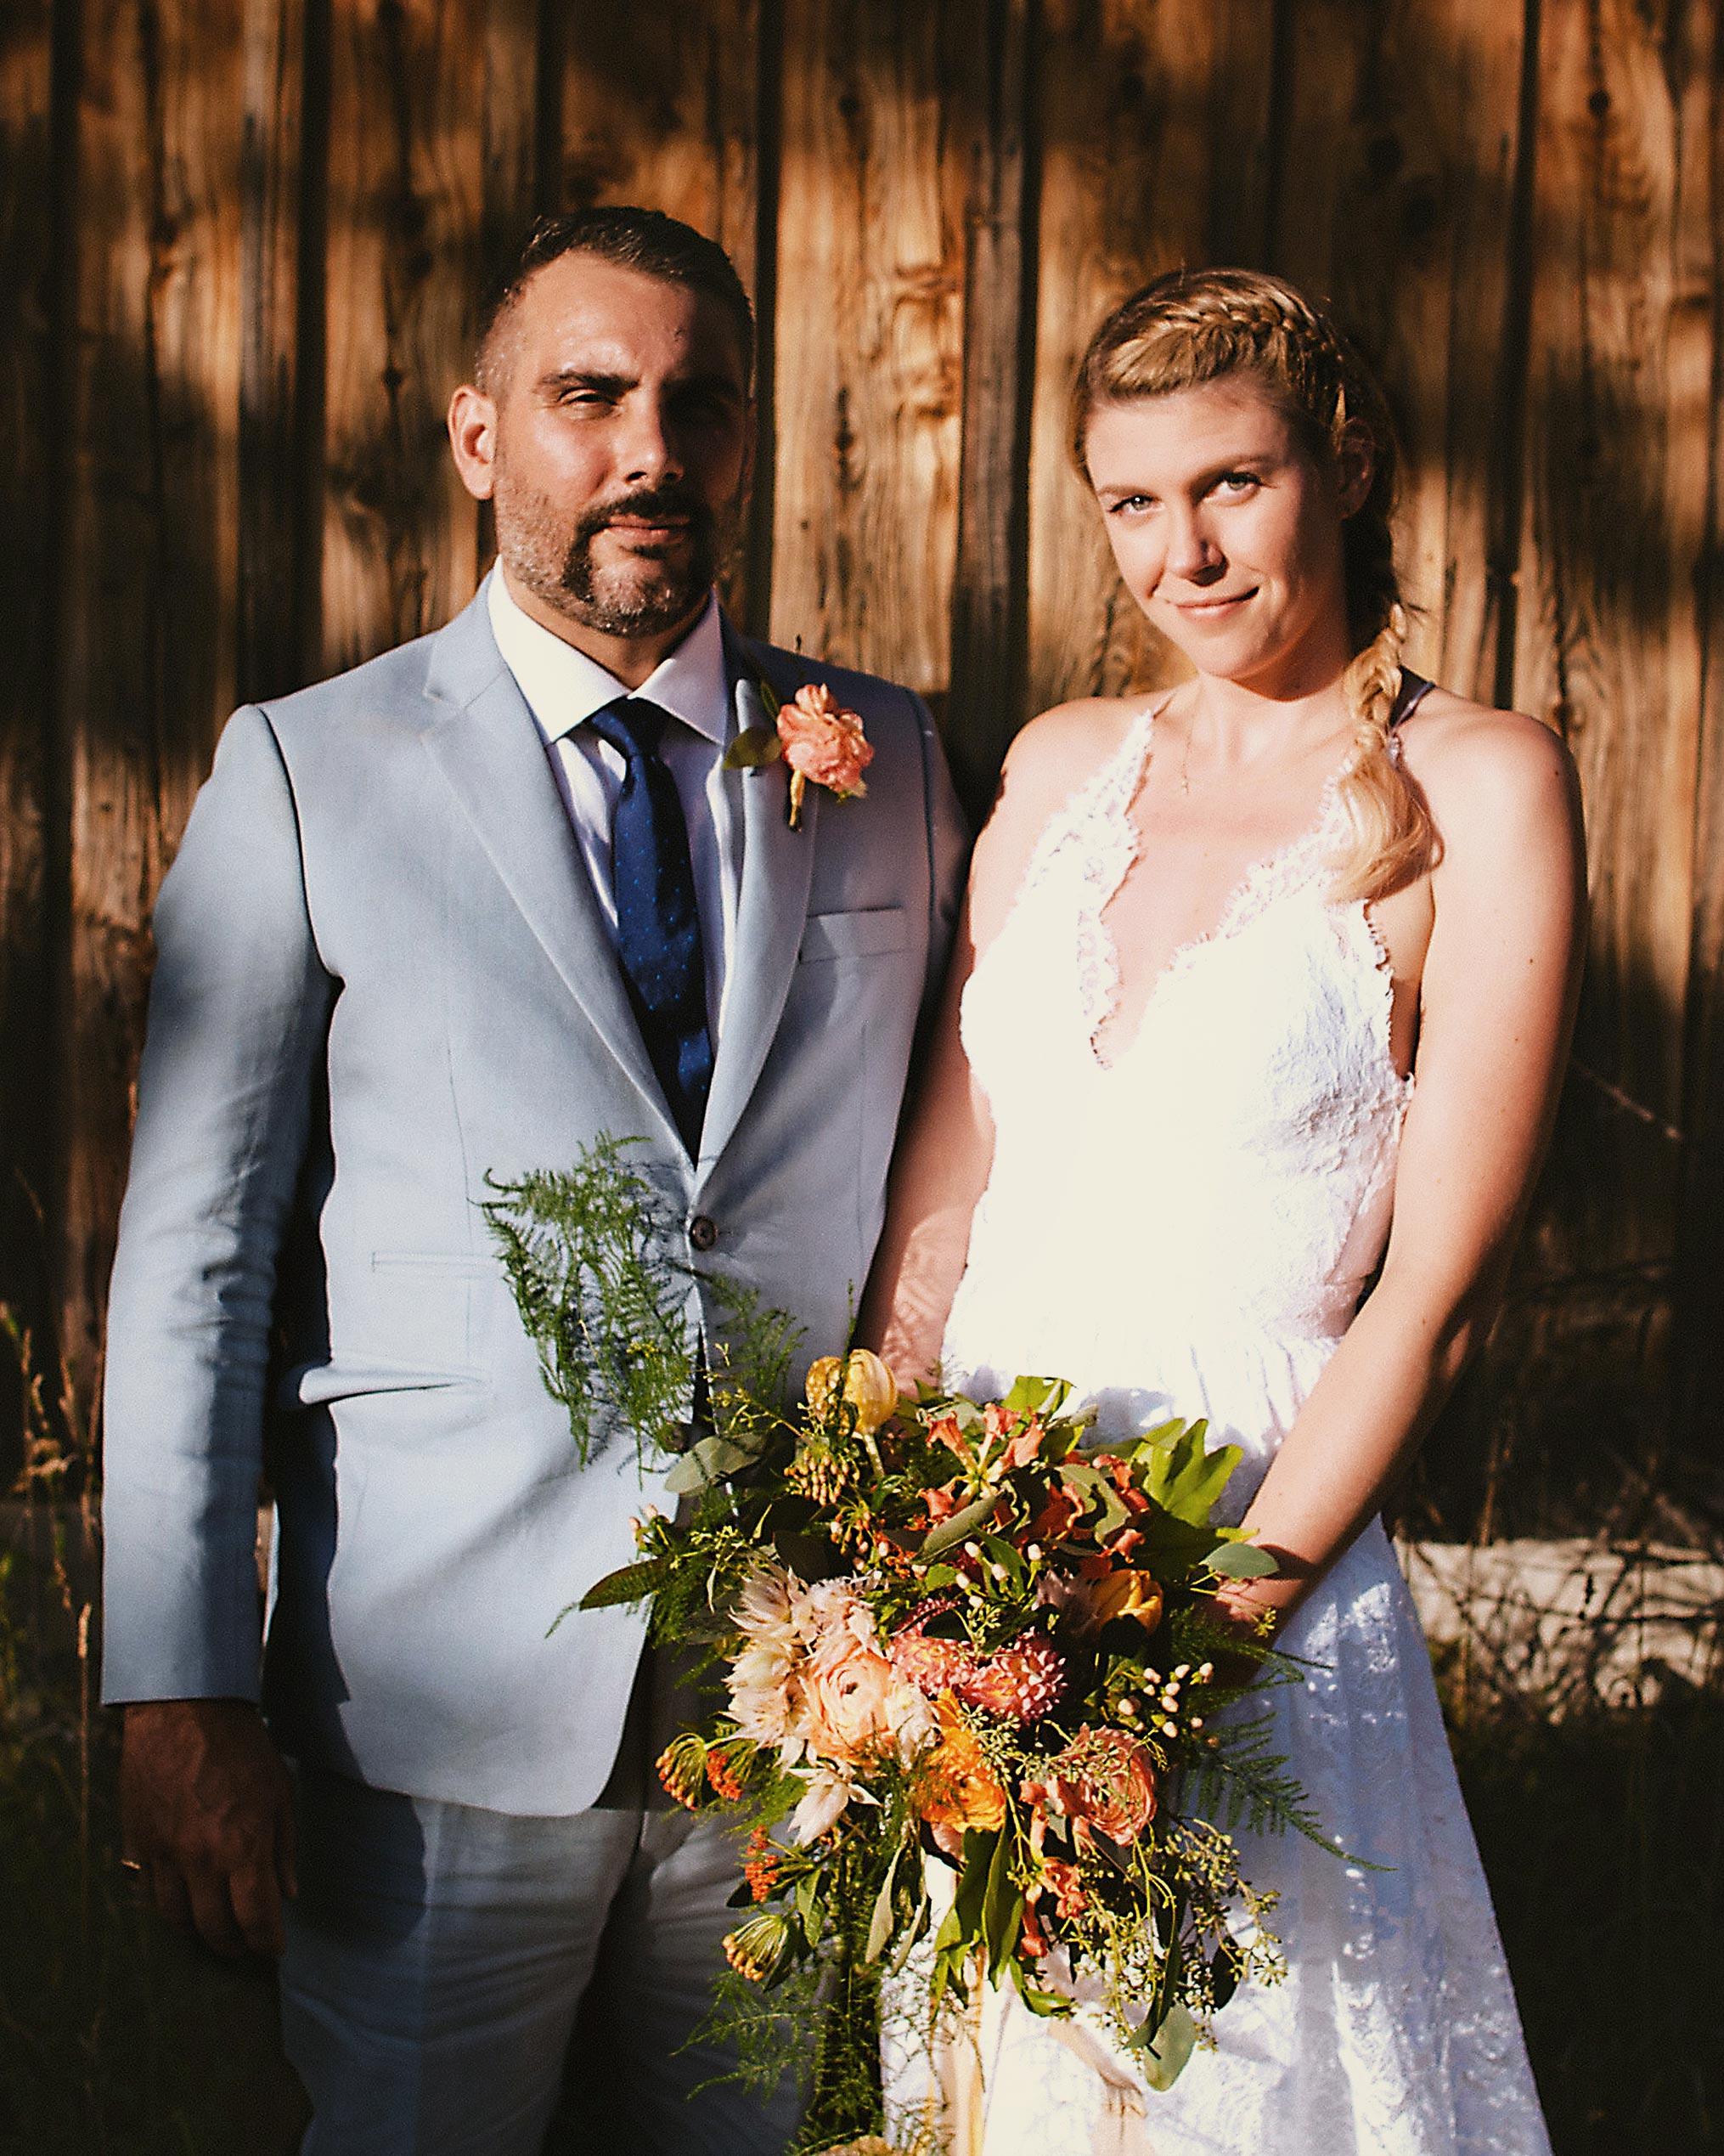 cat-vince-wedding-couple-021-s112646-0216.jpg